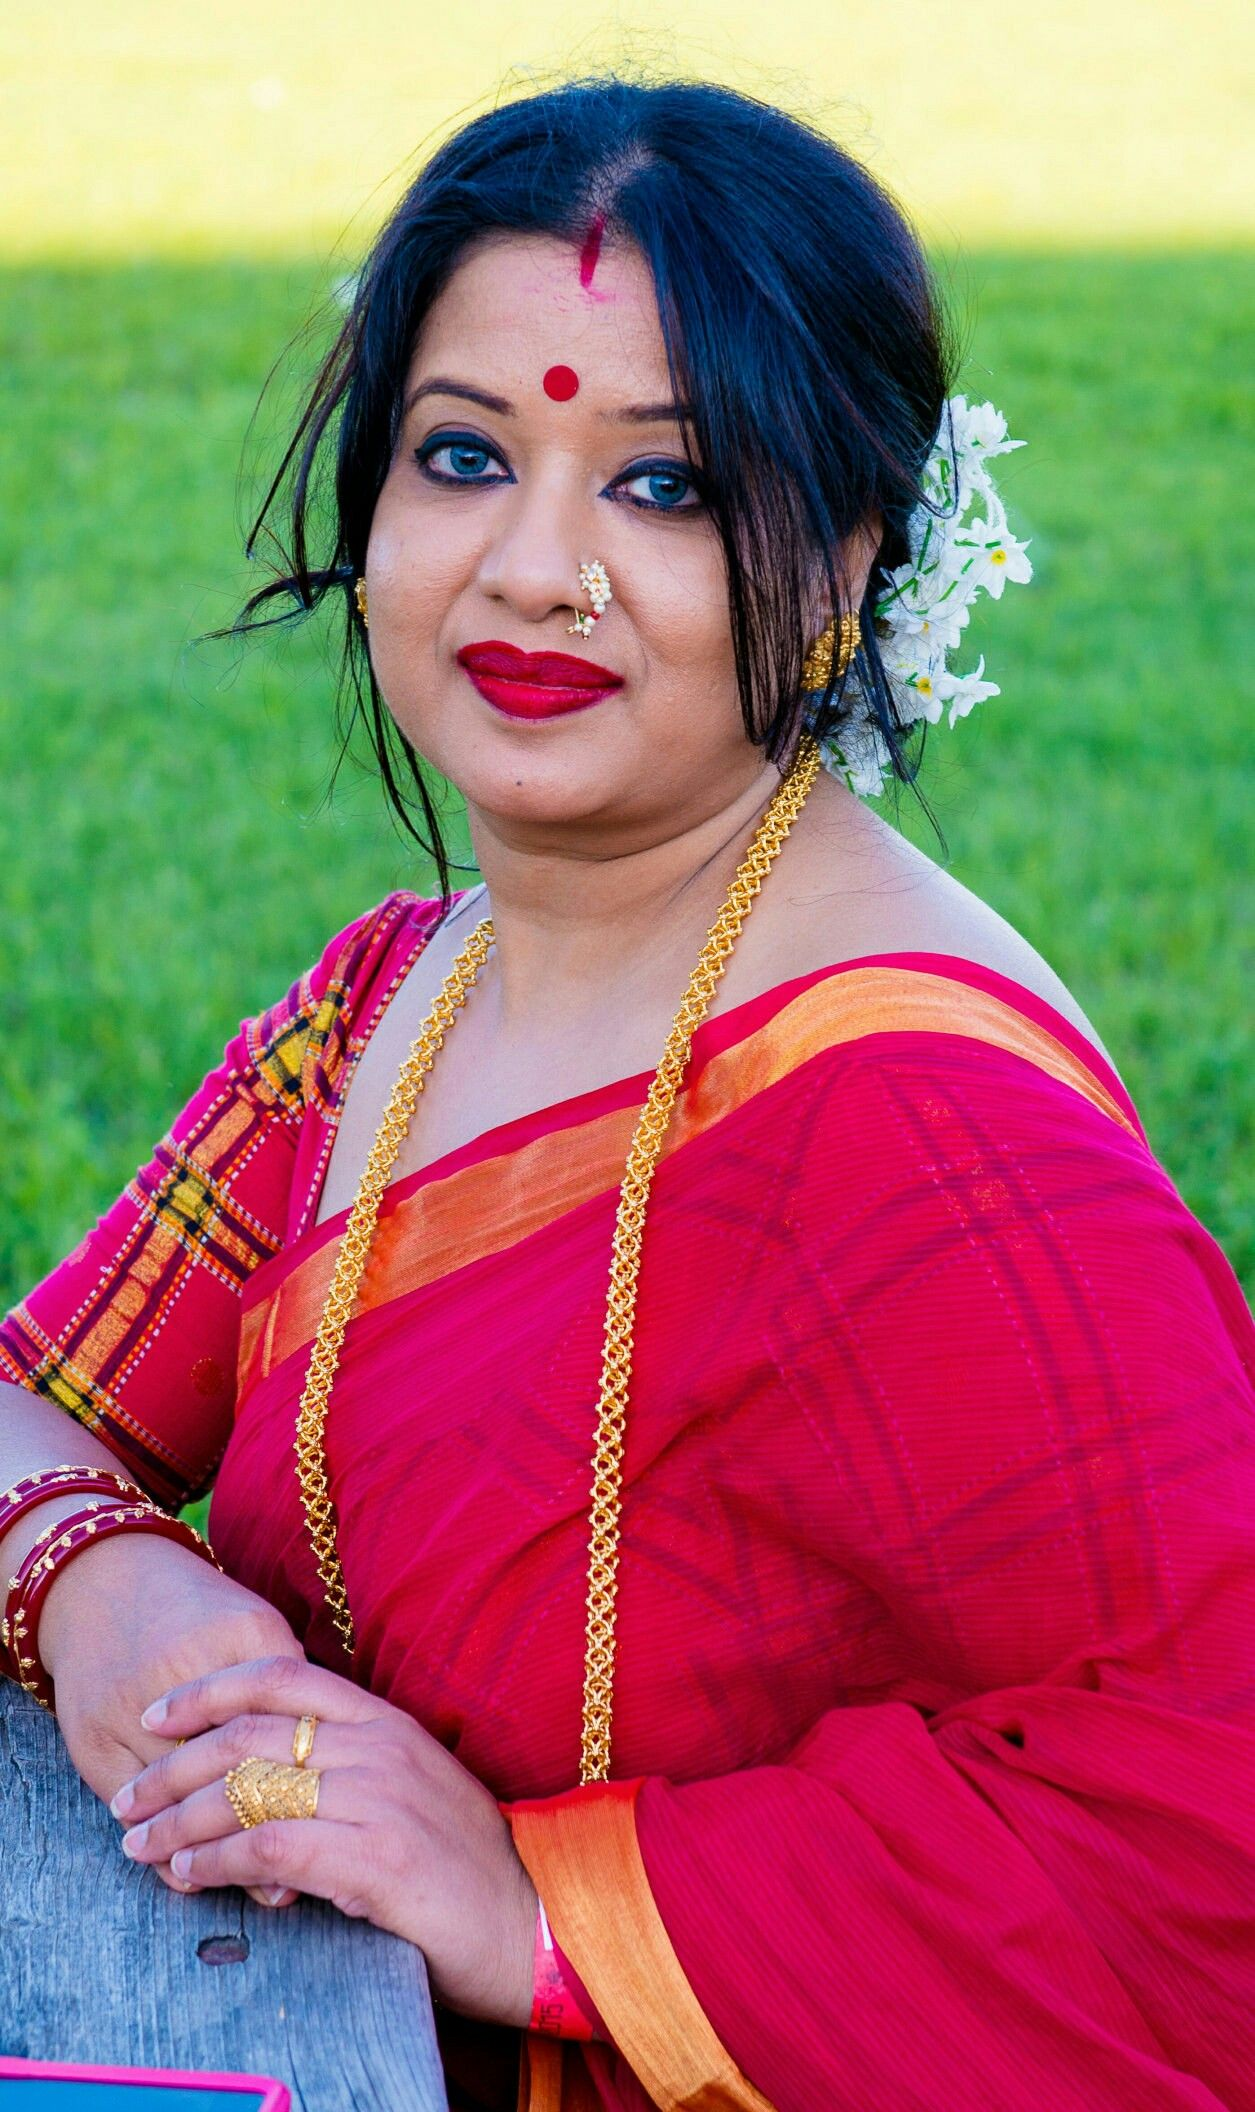 Nude Priyanka Gandhi Pretty mistukar | place of heaven | pinterest | nude, desi and fashion